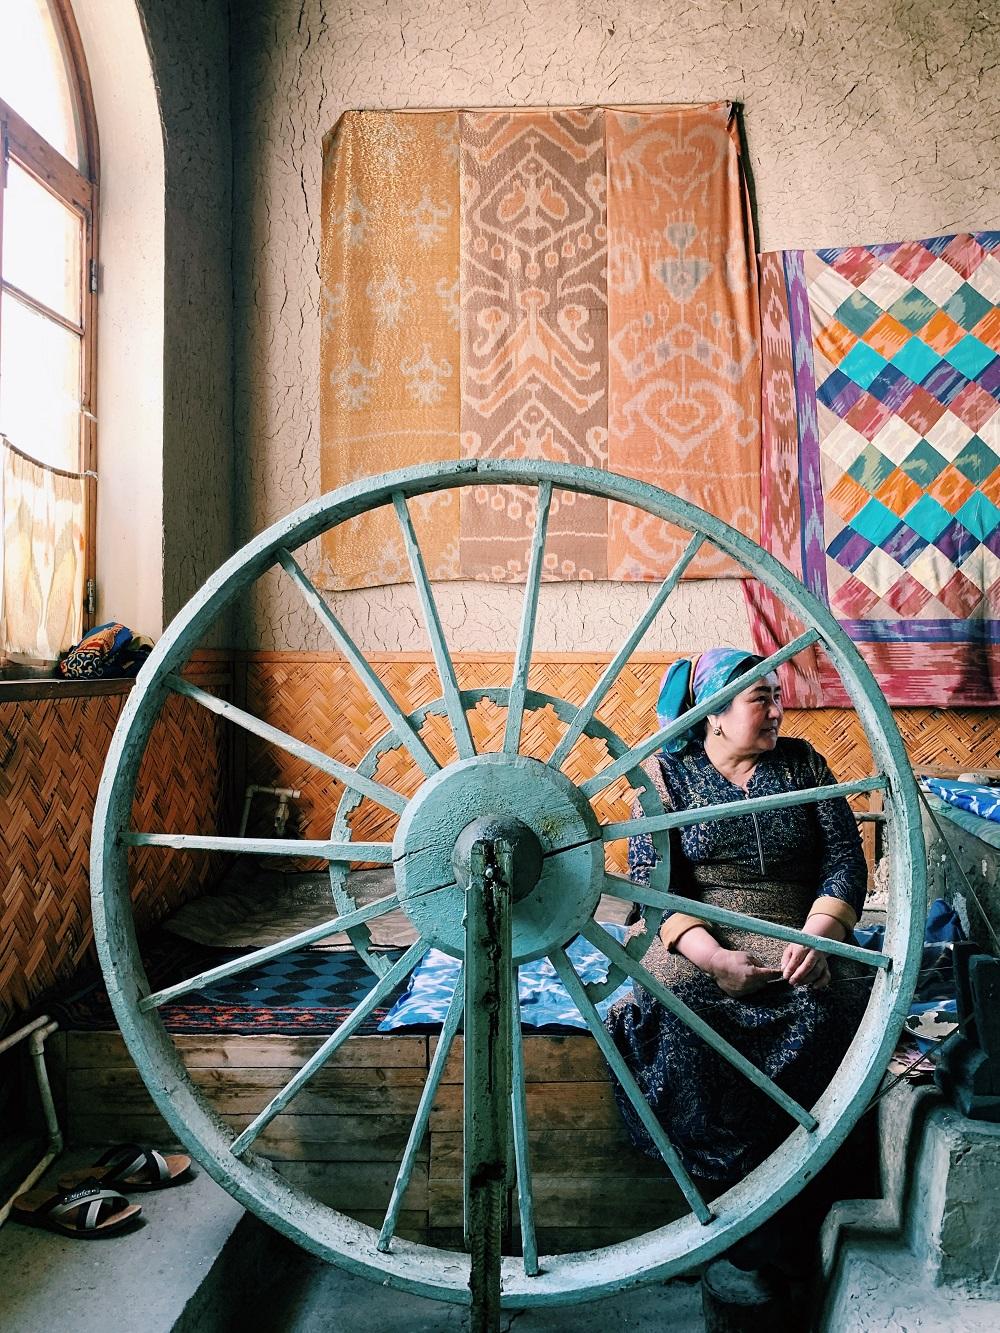 Fergana valle uzbekistan silk road credits thelostavocado.com